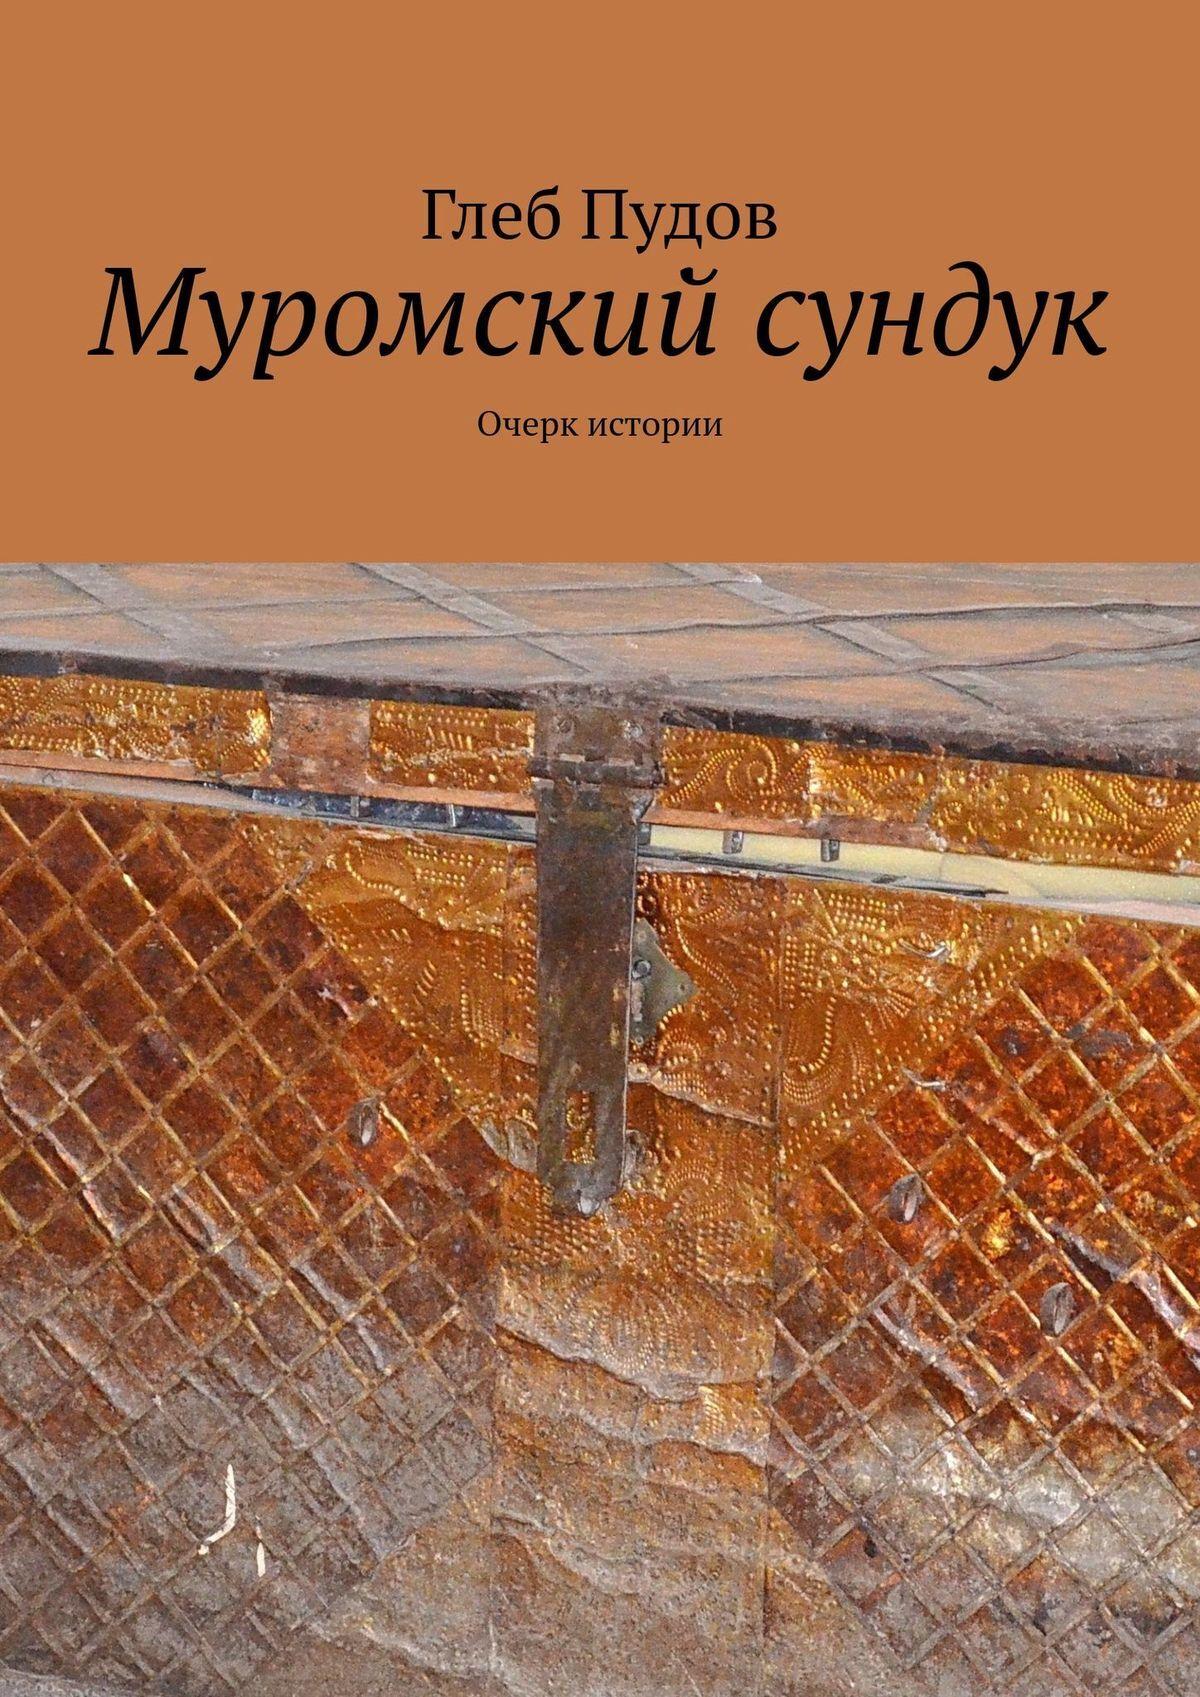 Муромский сундук. Очерк истории